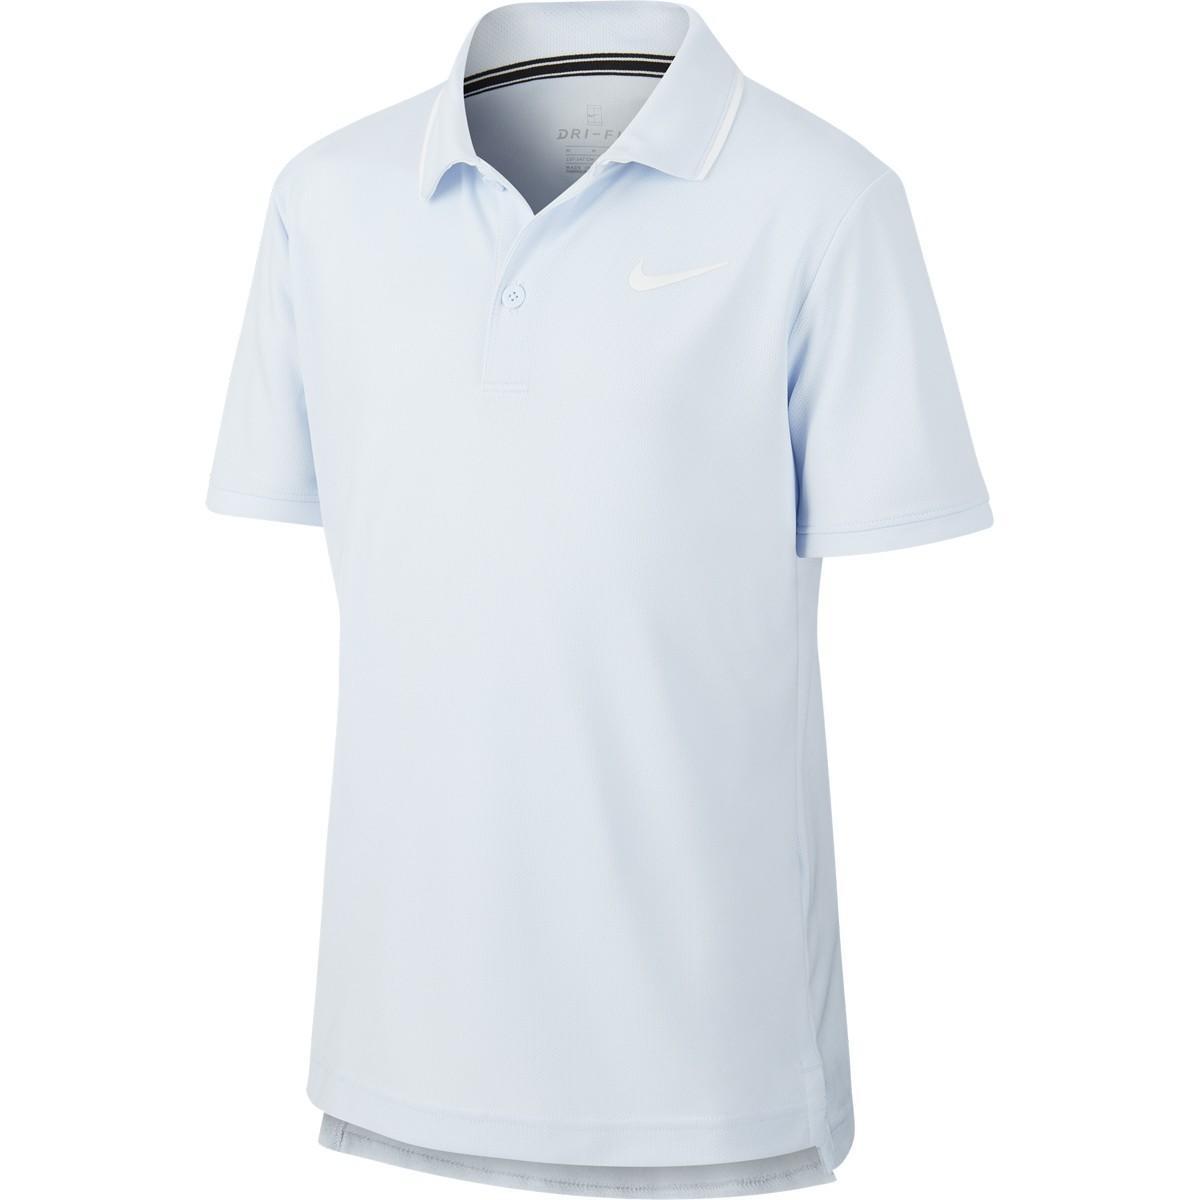 Теннисная футболка детская Nike Court Dry Polo light blue поло